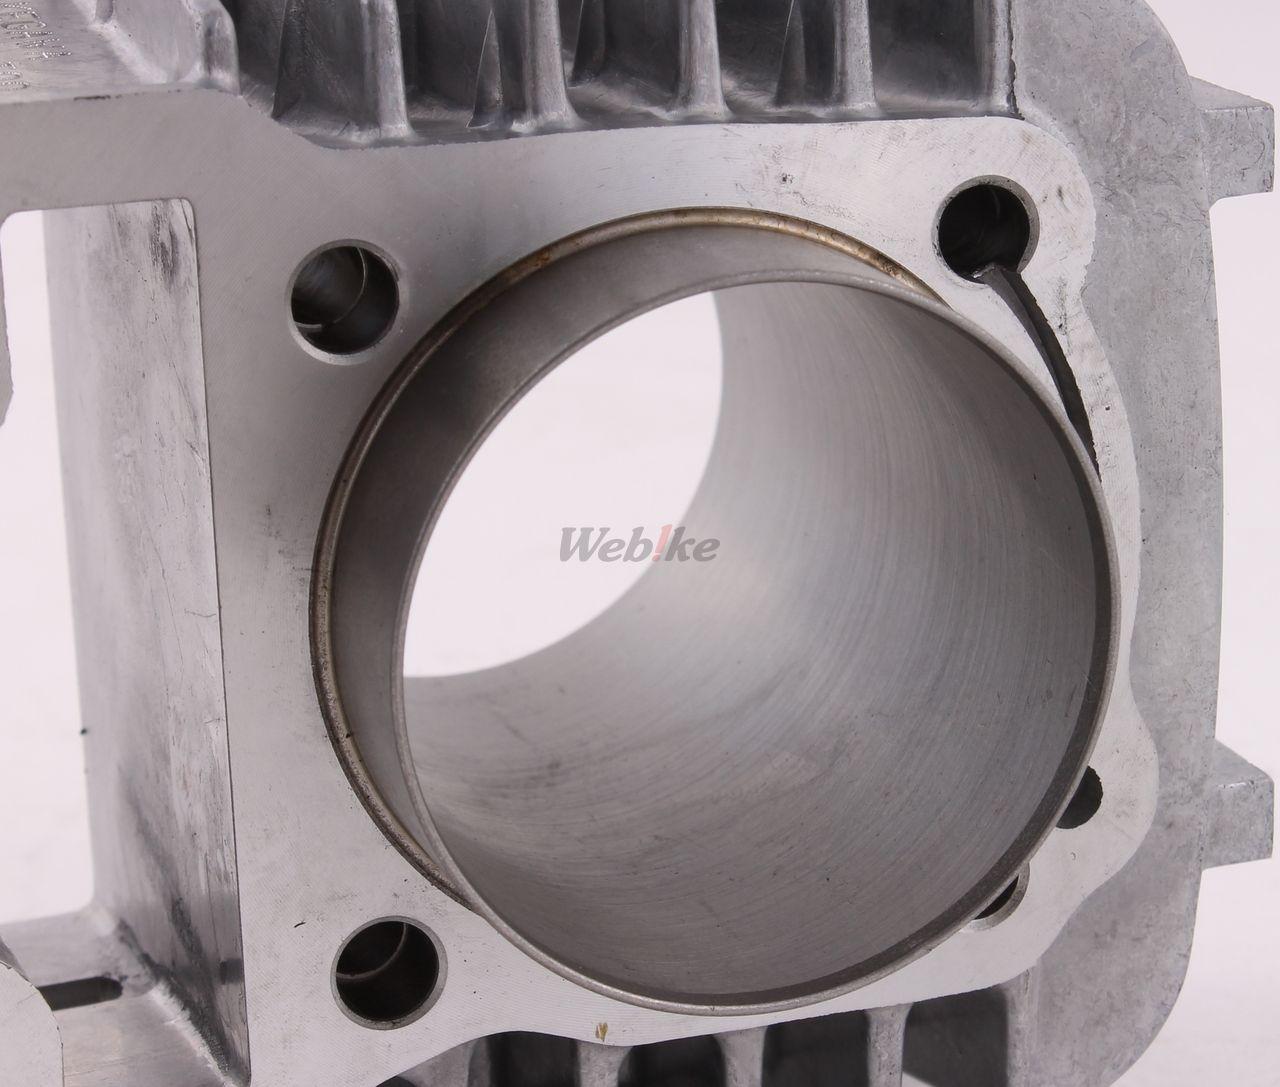 【SP武川】Hyper S Stage 加大缸徑套件125cc - 「Webike-摩托百貨」